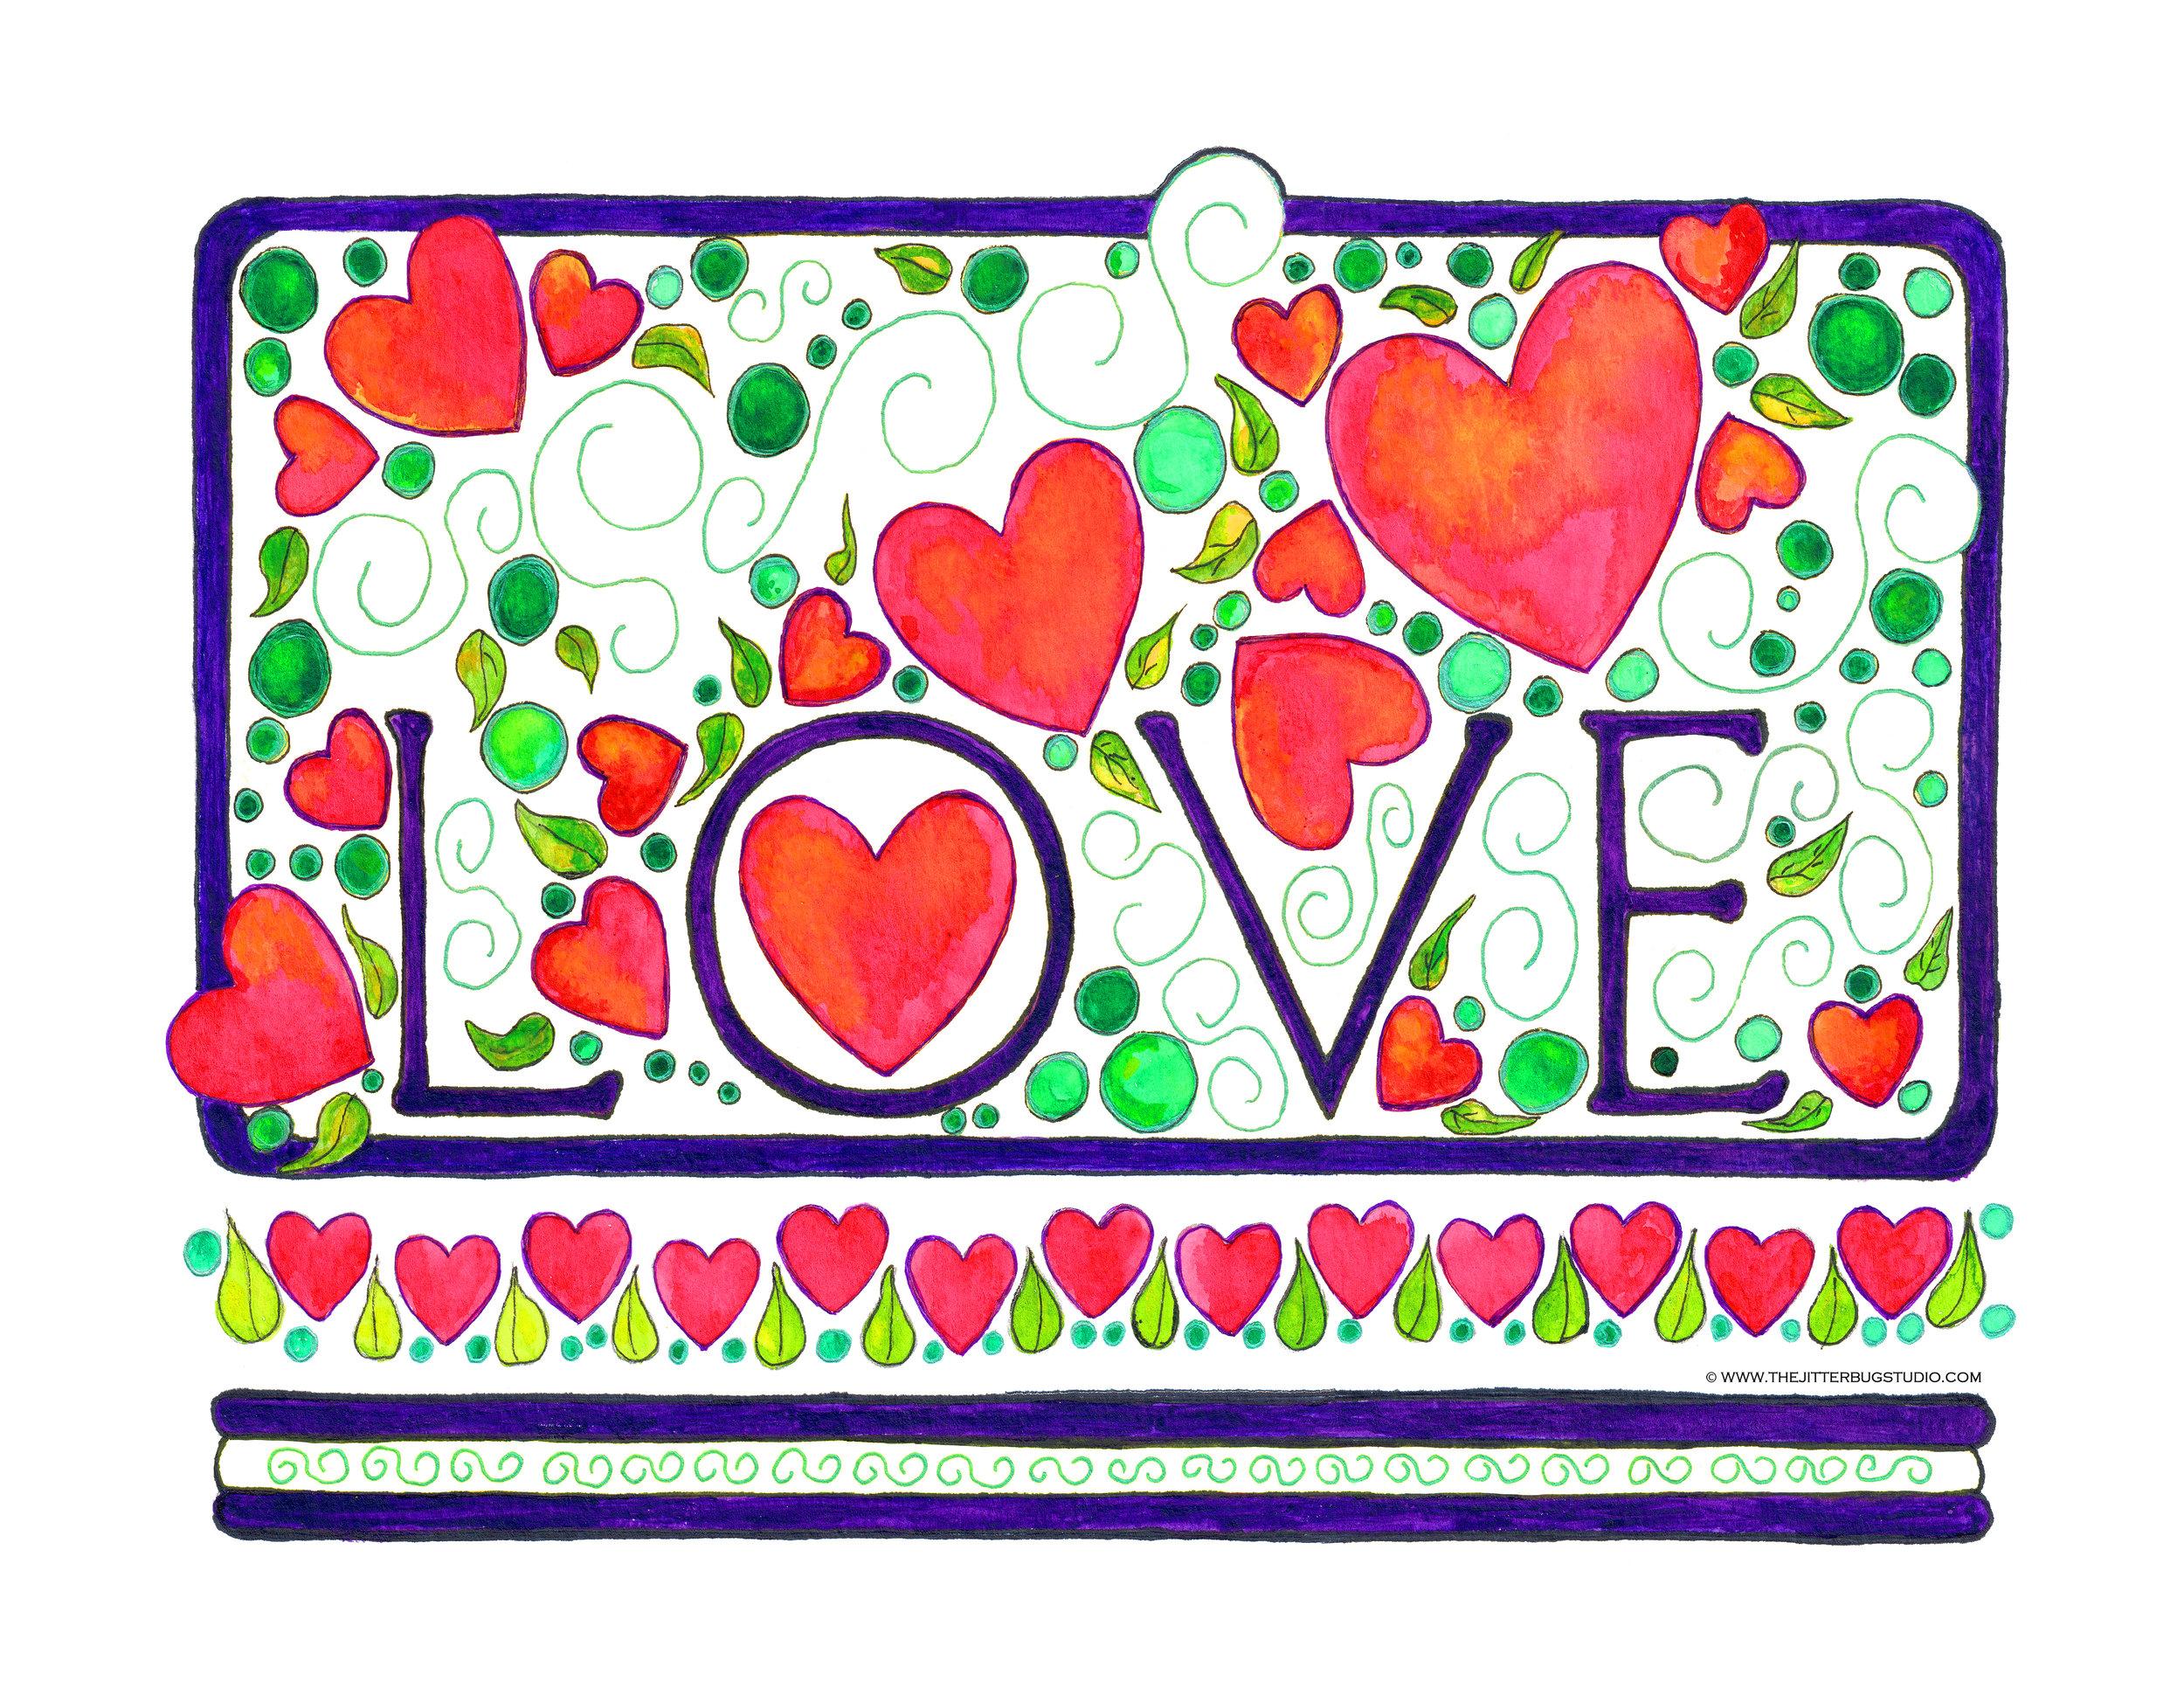 LOVE 8X10 white2 8x10.jpg